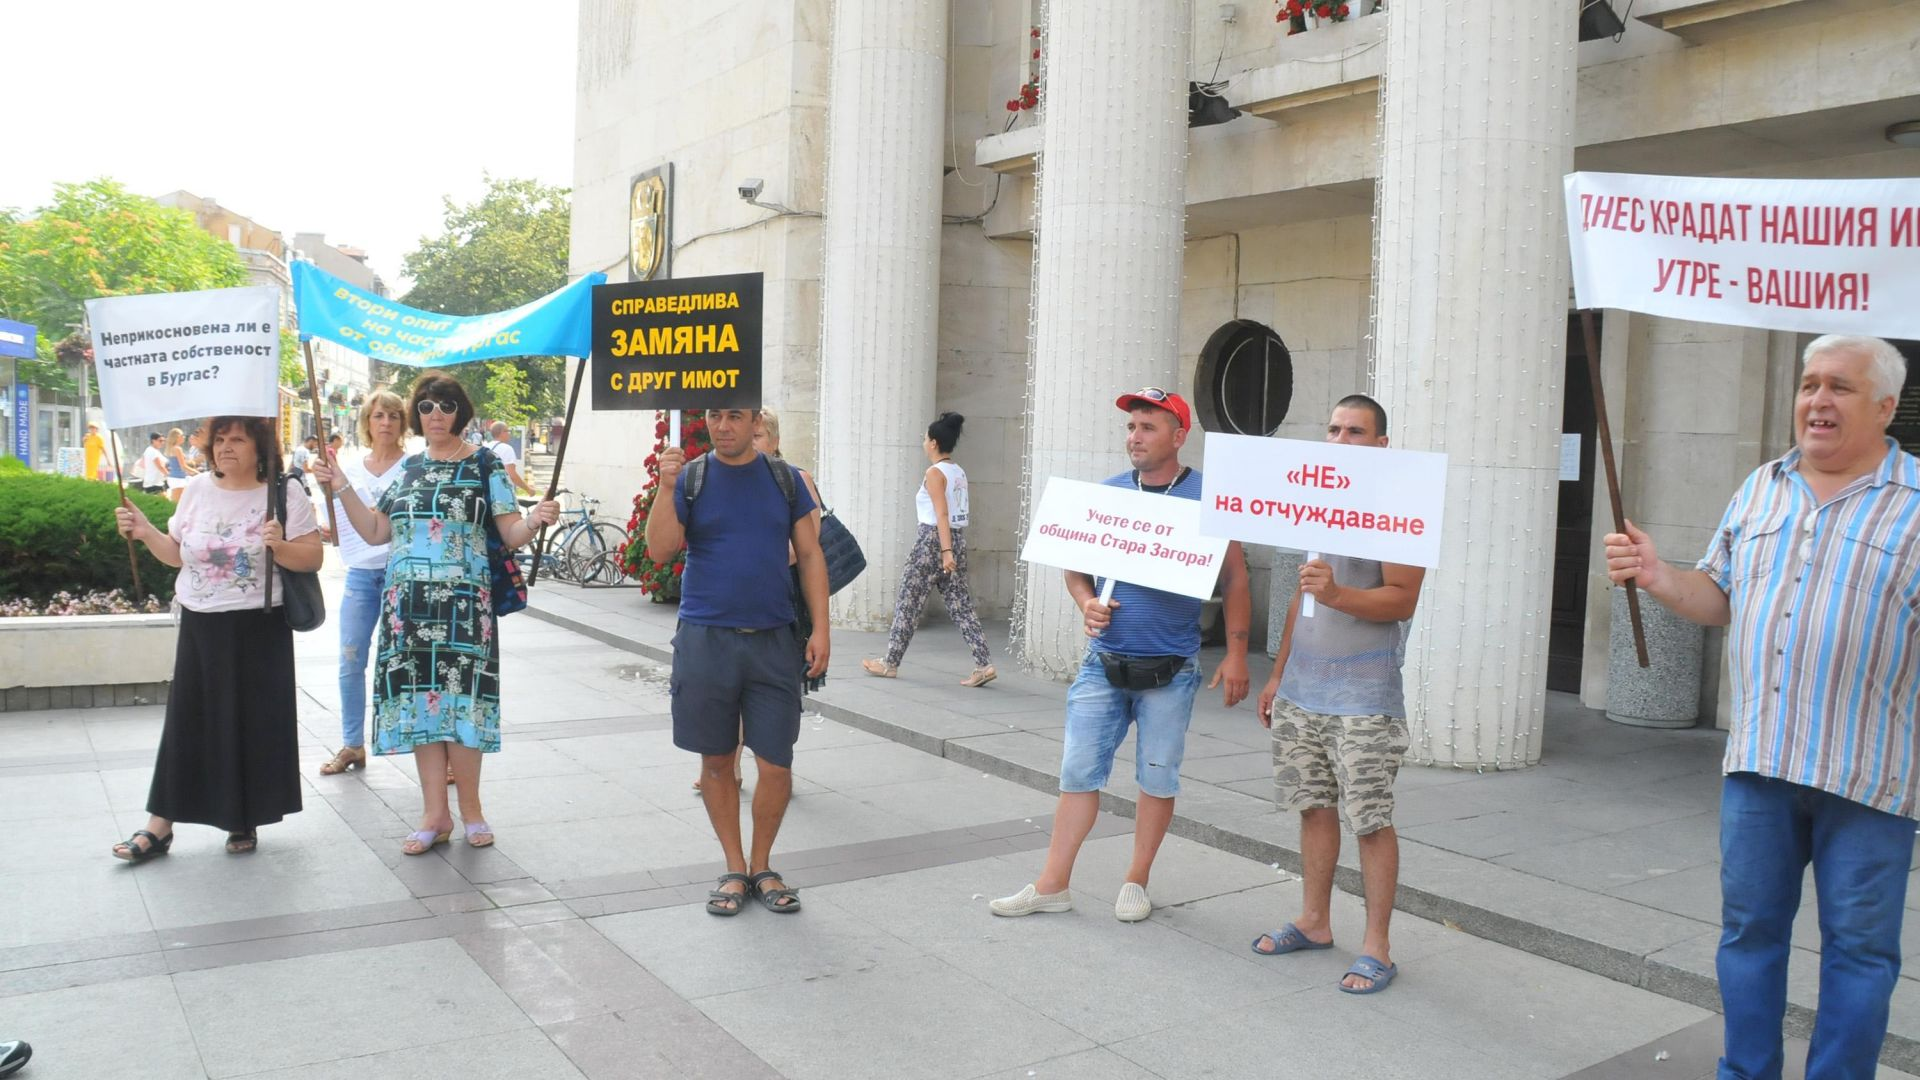 Протест на собственици на имот заради спрян строеж в Бургас (снимки)